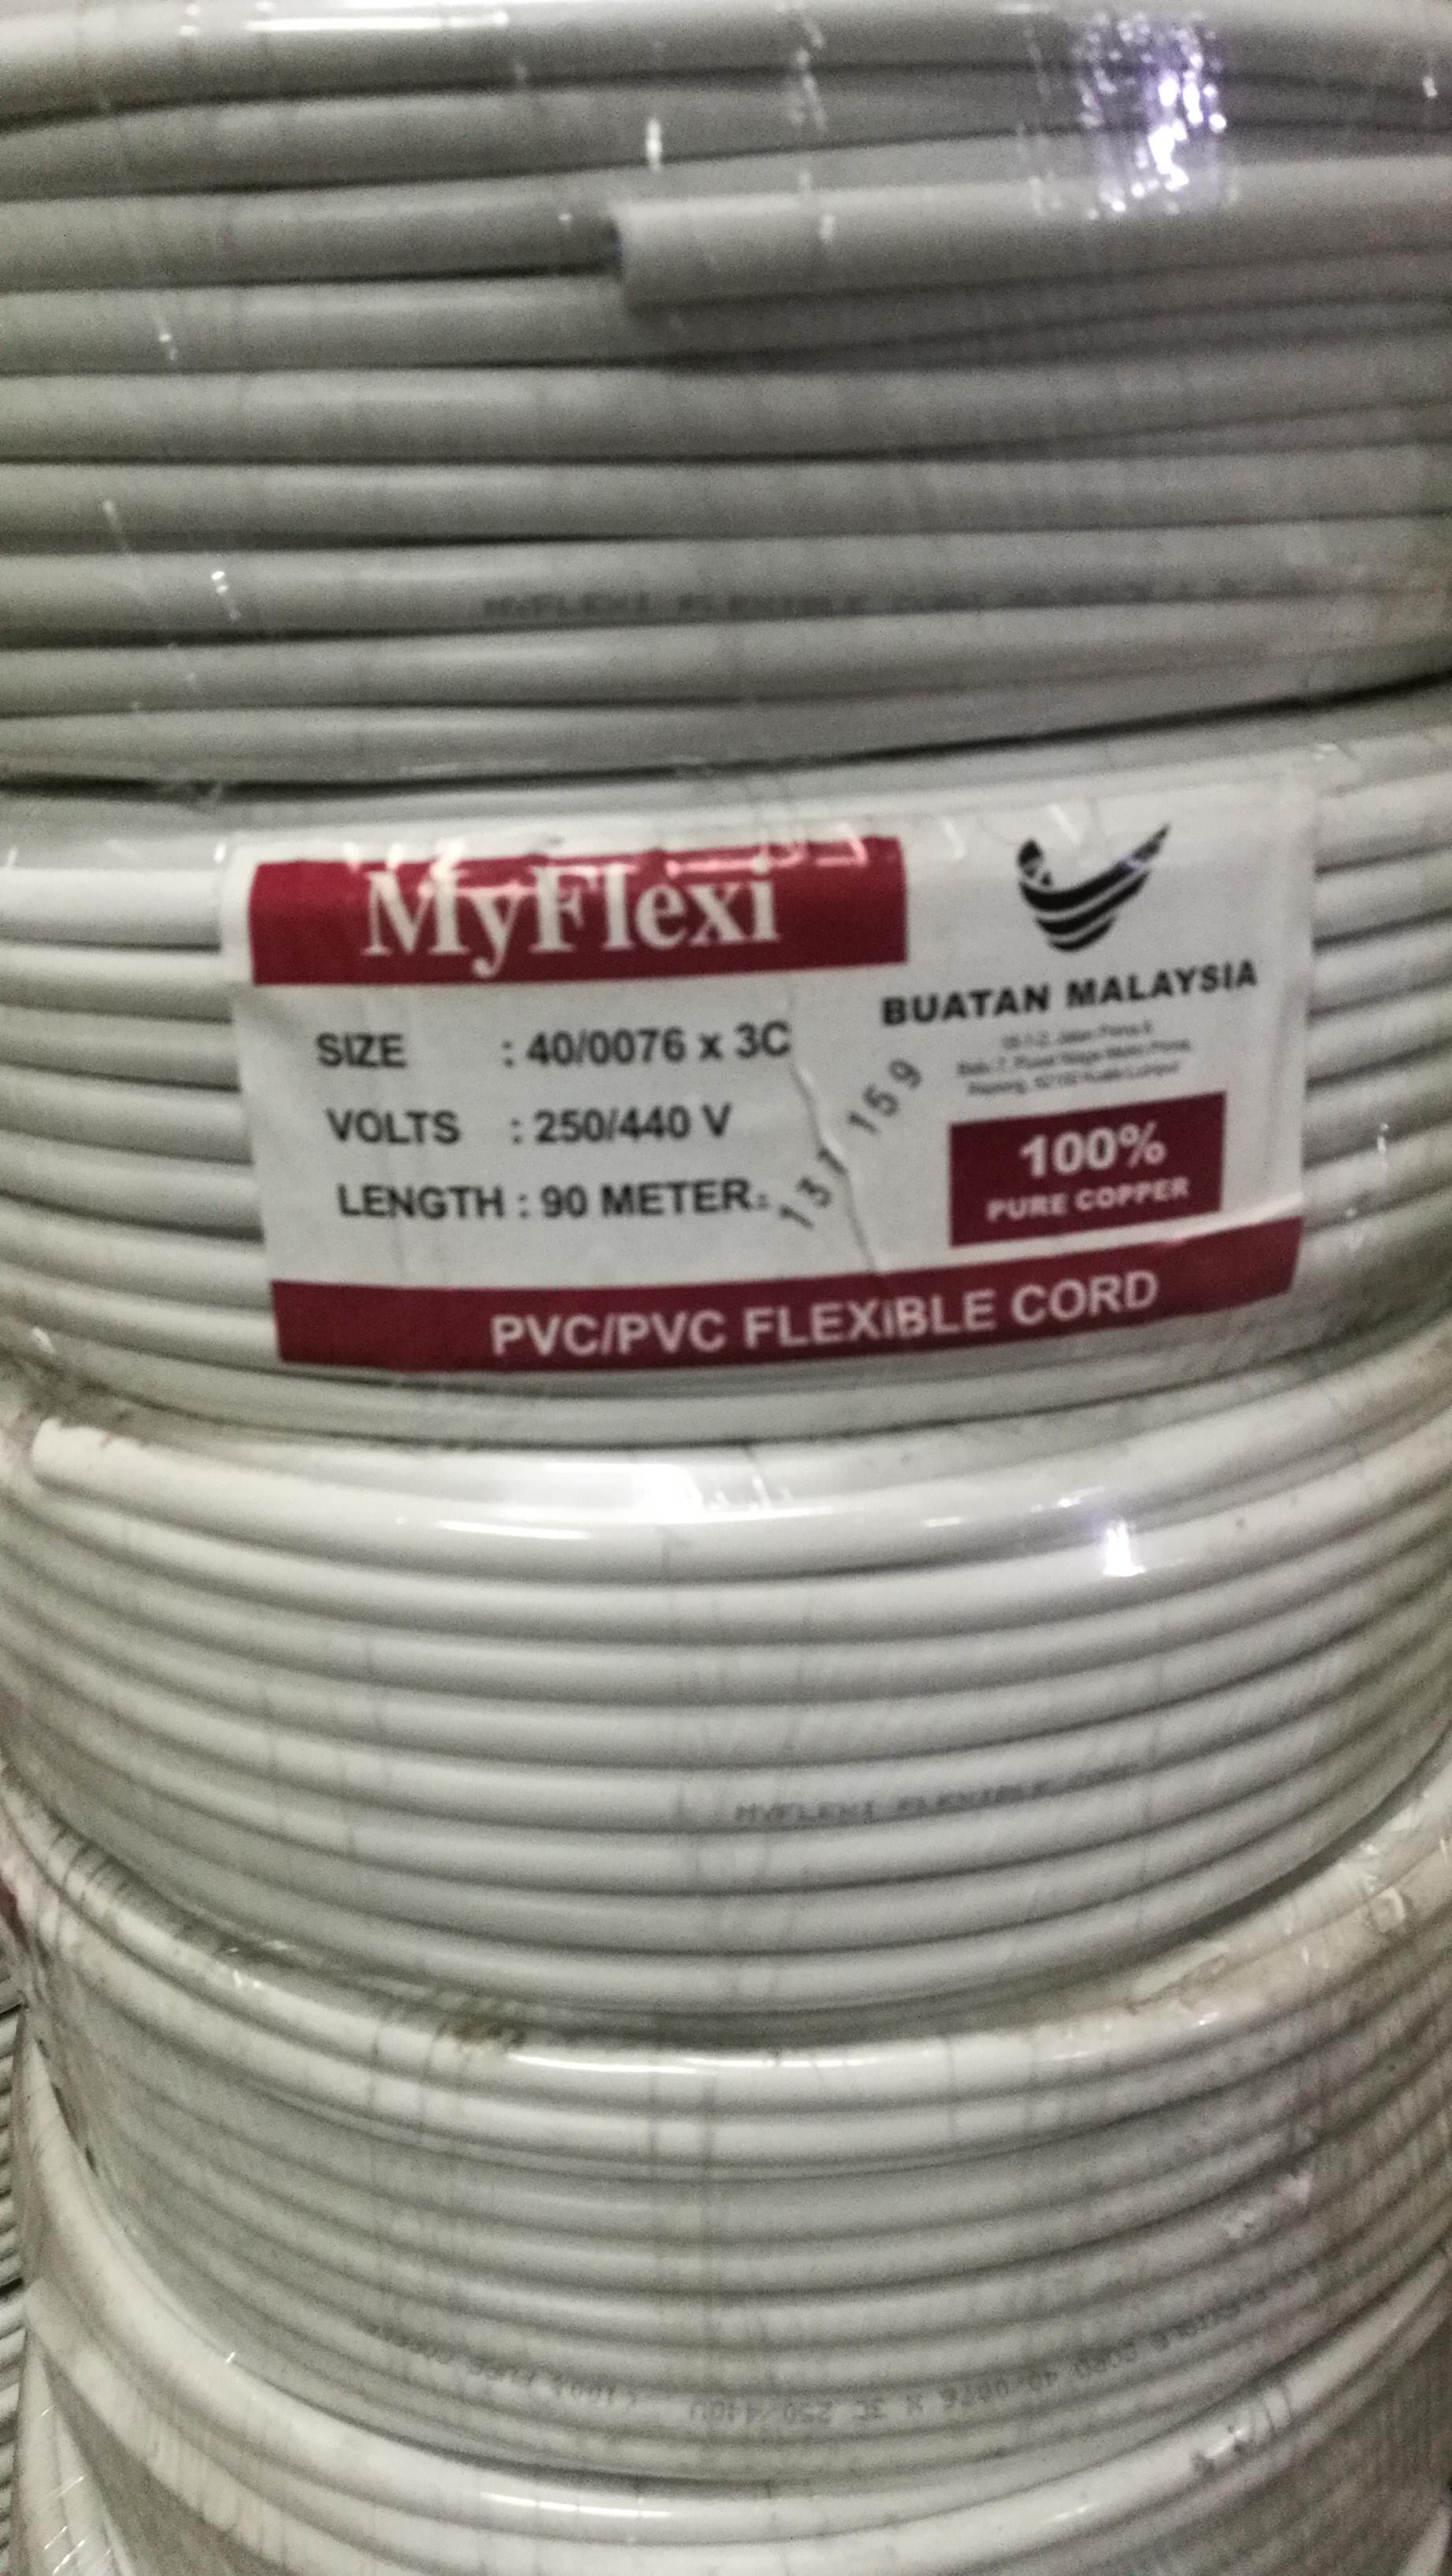 MyFlexi flexible cable (40/0076 3core )